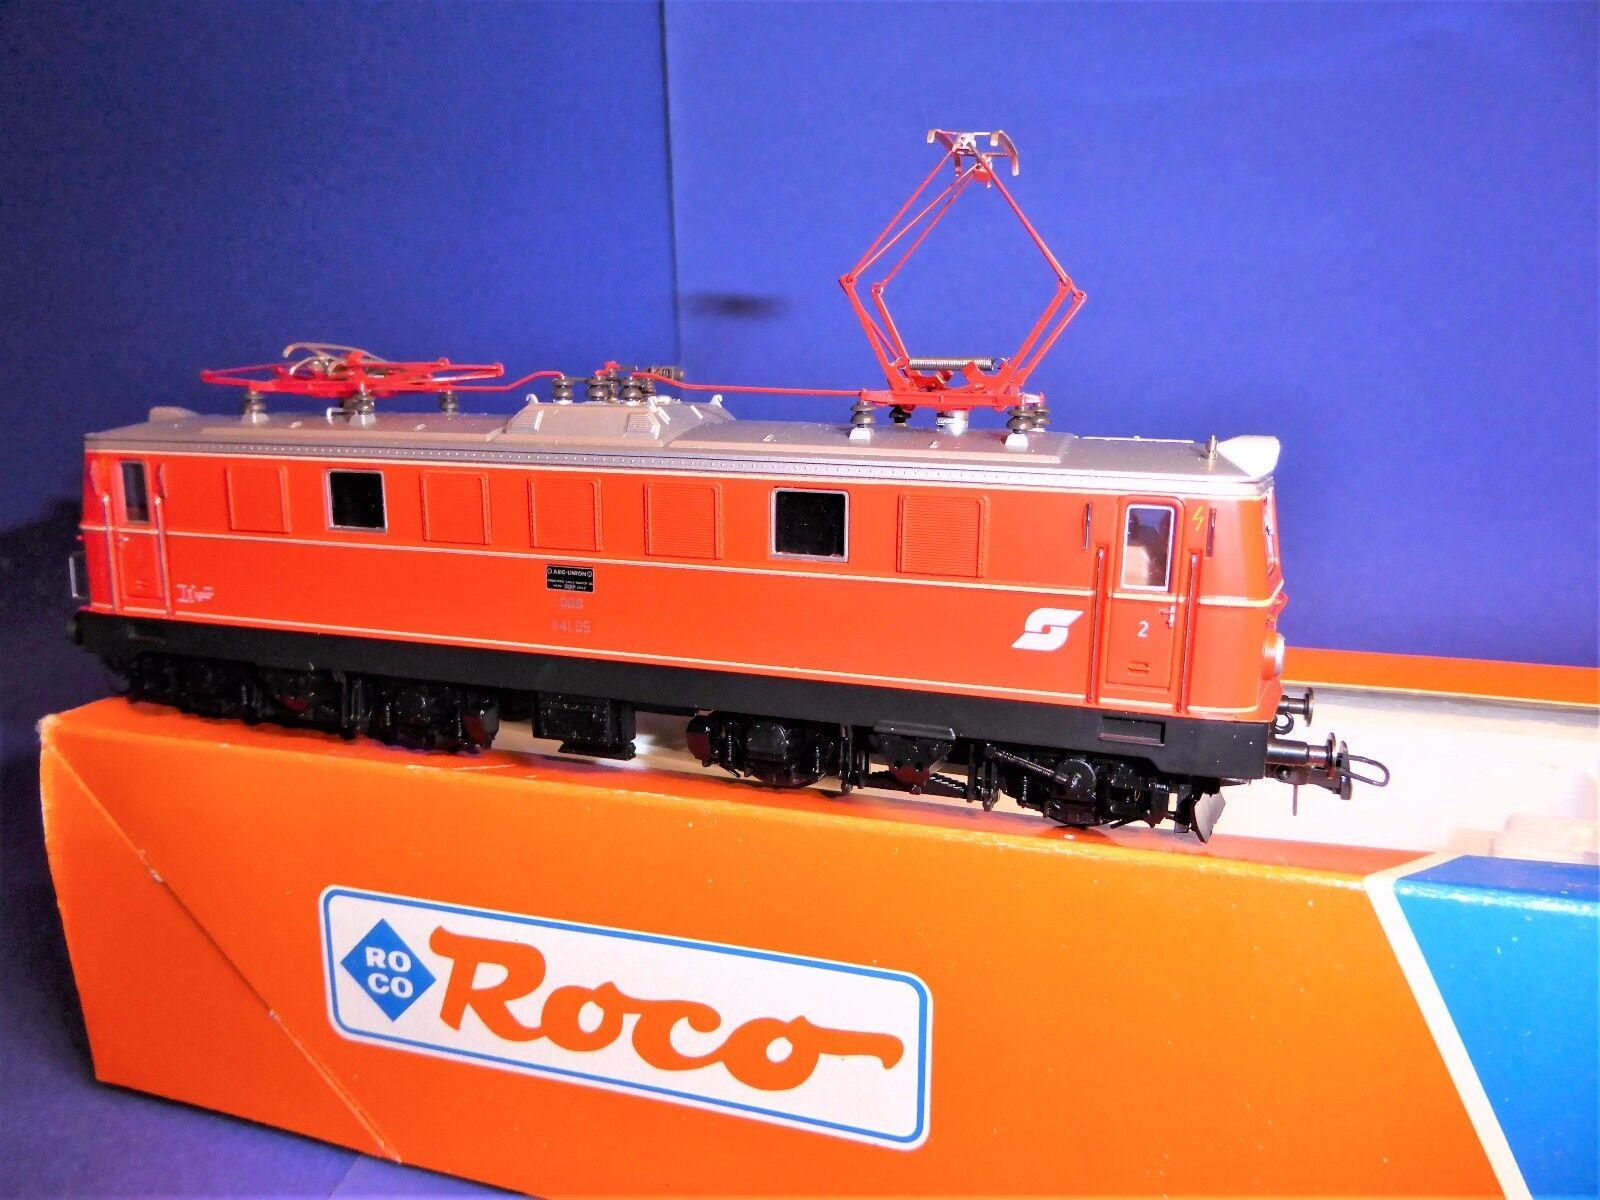 ROCO H0 43641 E1141.05 E1141.05 E1141.05 ÖBB E-Lok  | Exzellente Verarbeitung  2d5820